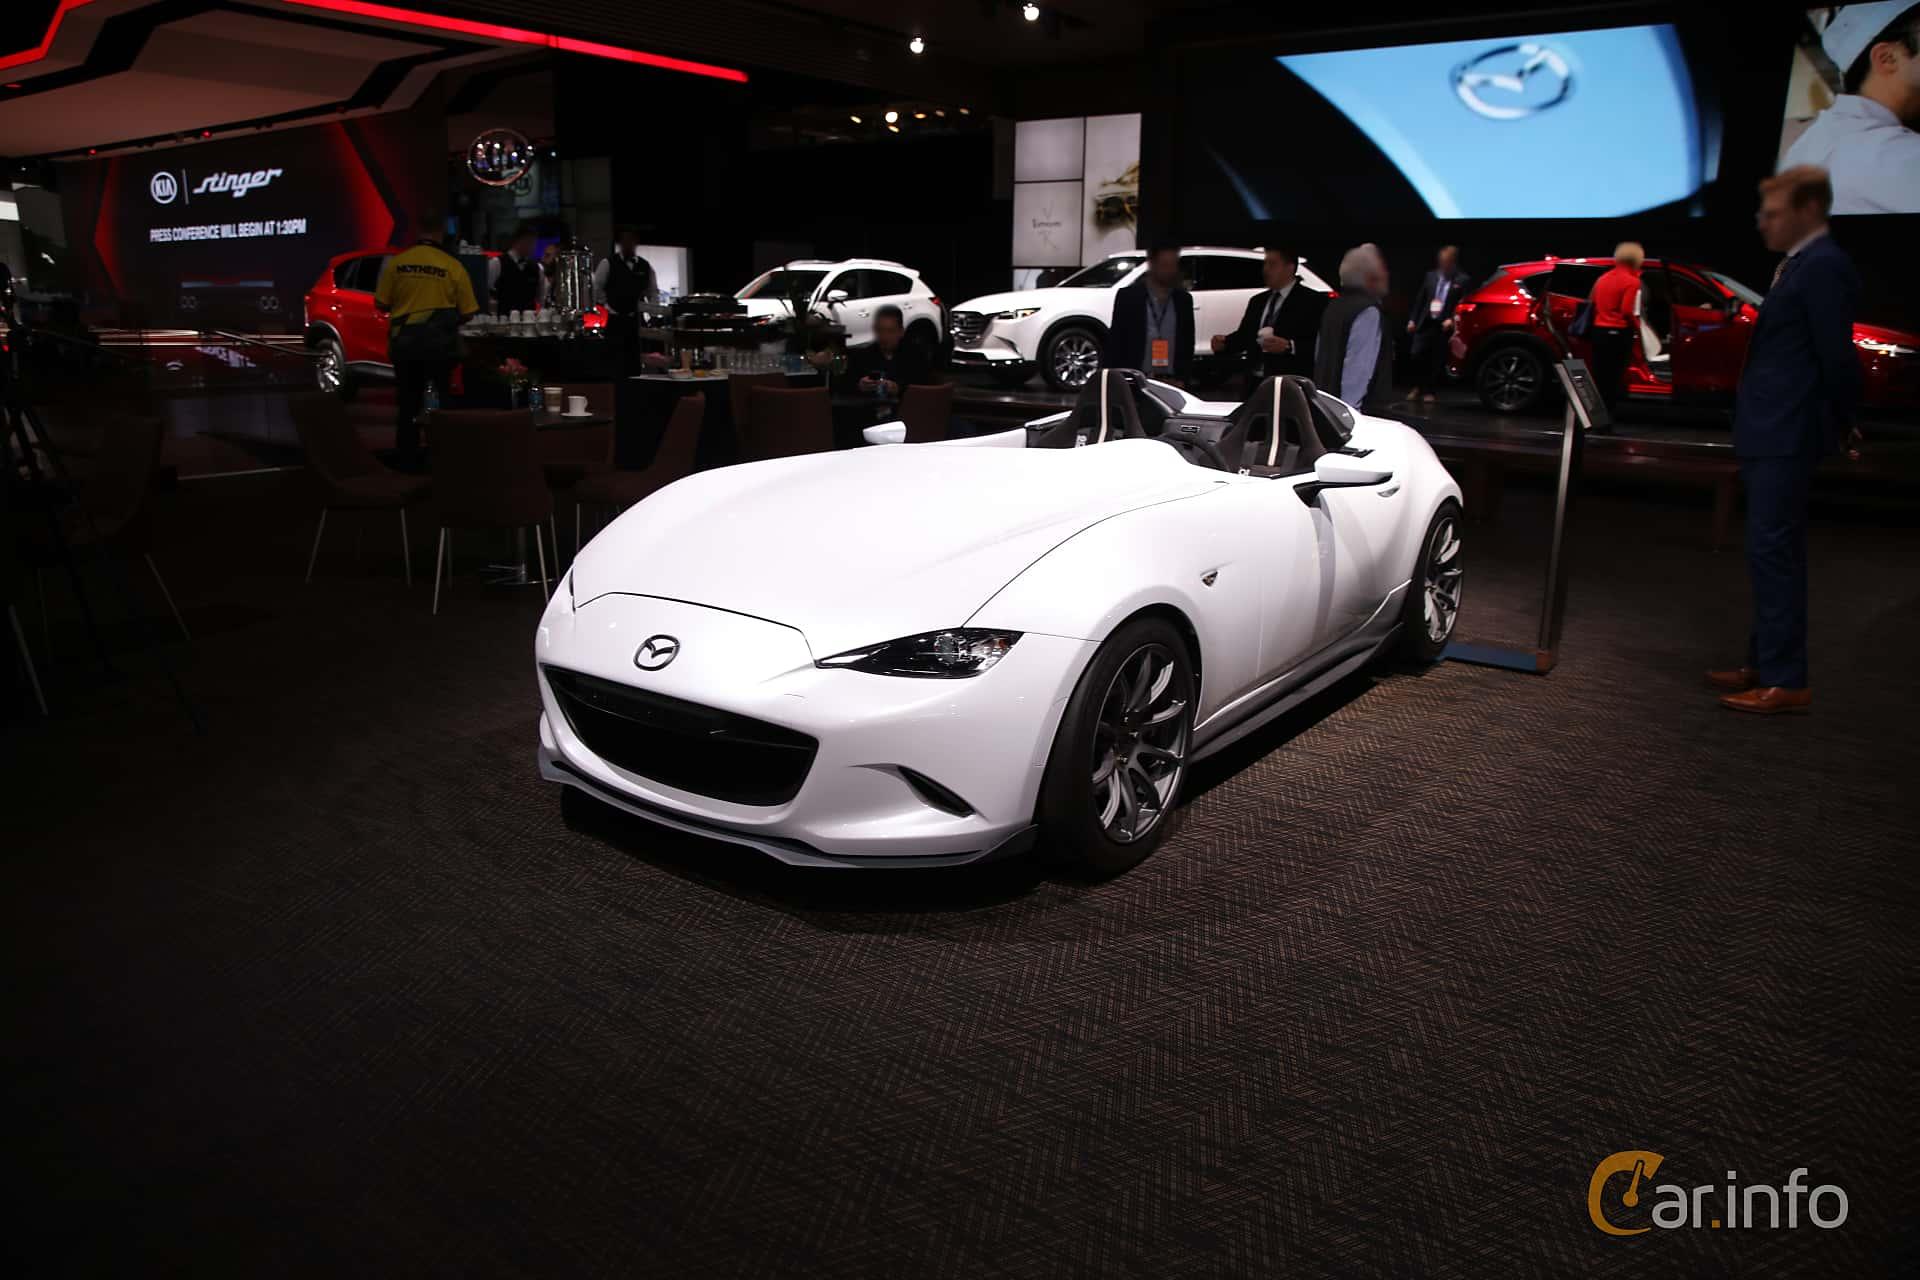 https://s.car.info/image_files/1920/mazda-mx-5-miata-speedster-evolution-front-side-north-american-international-auto-show-2017-2-318257.jpg